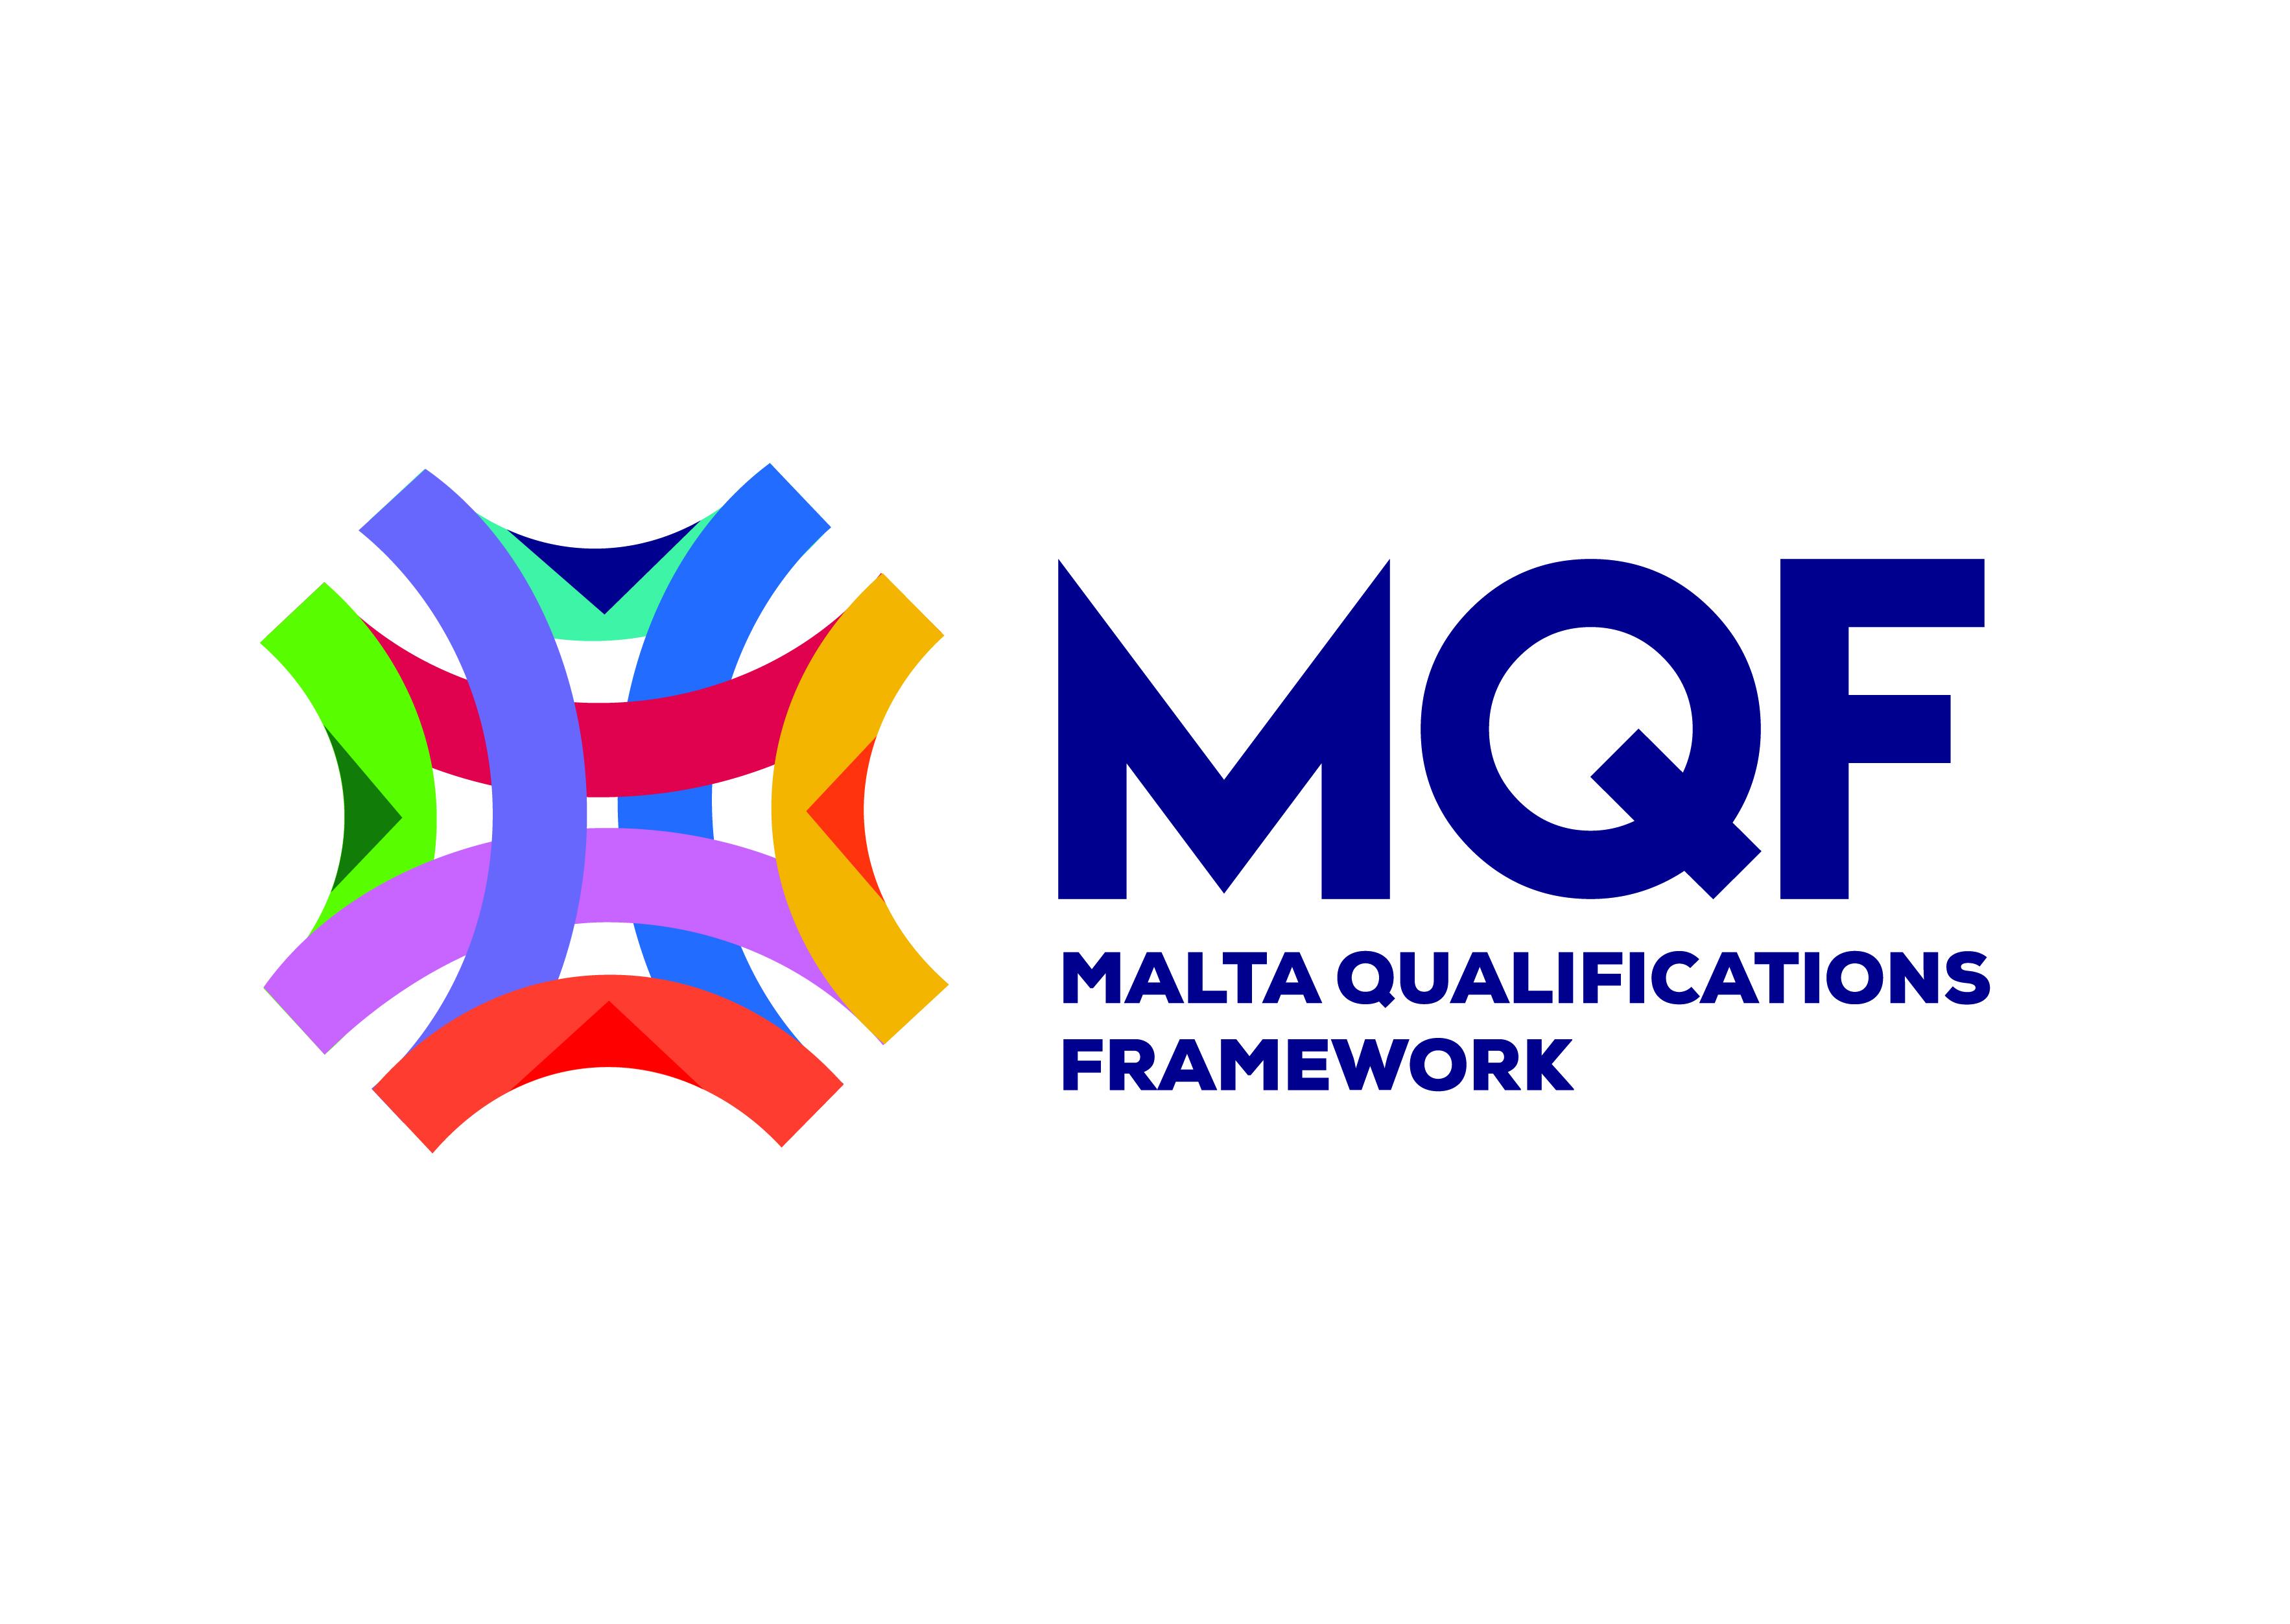 Malta Qualifications Framework - Malta Further & Higher Education Authority